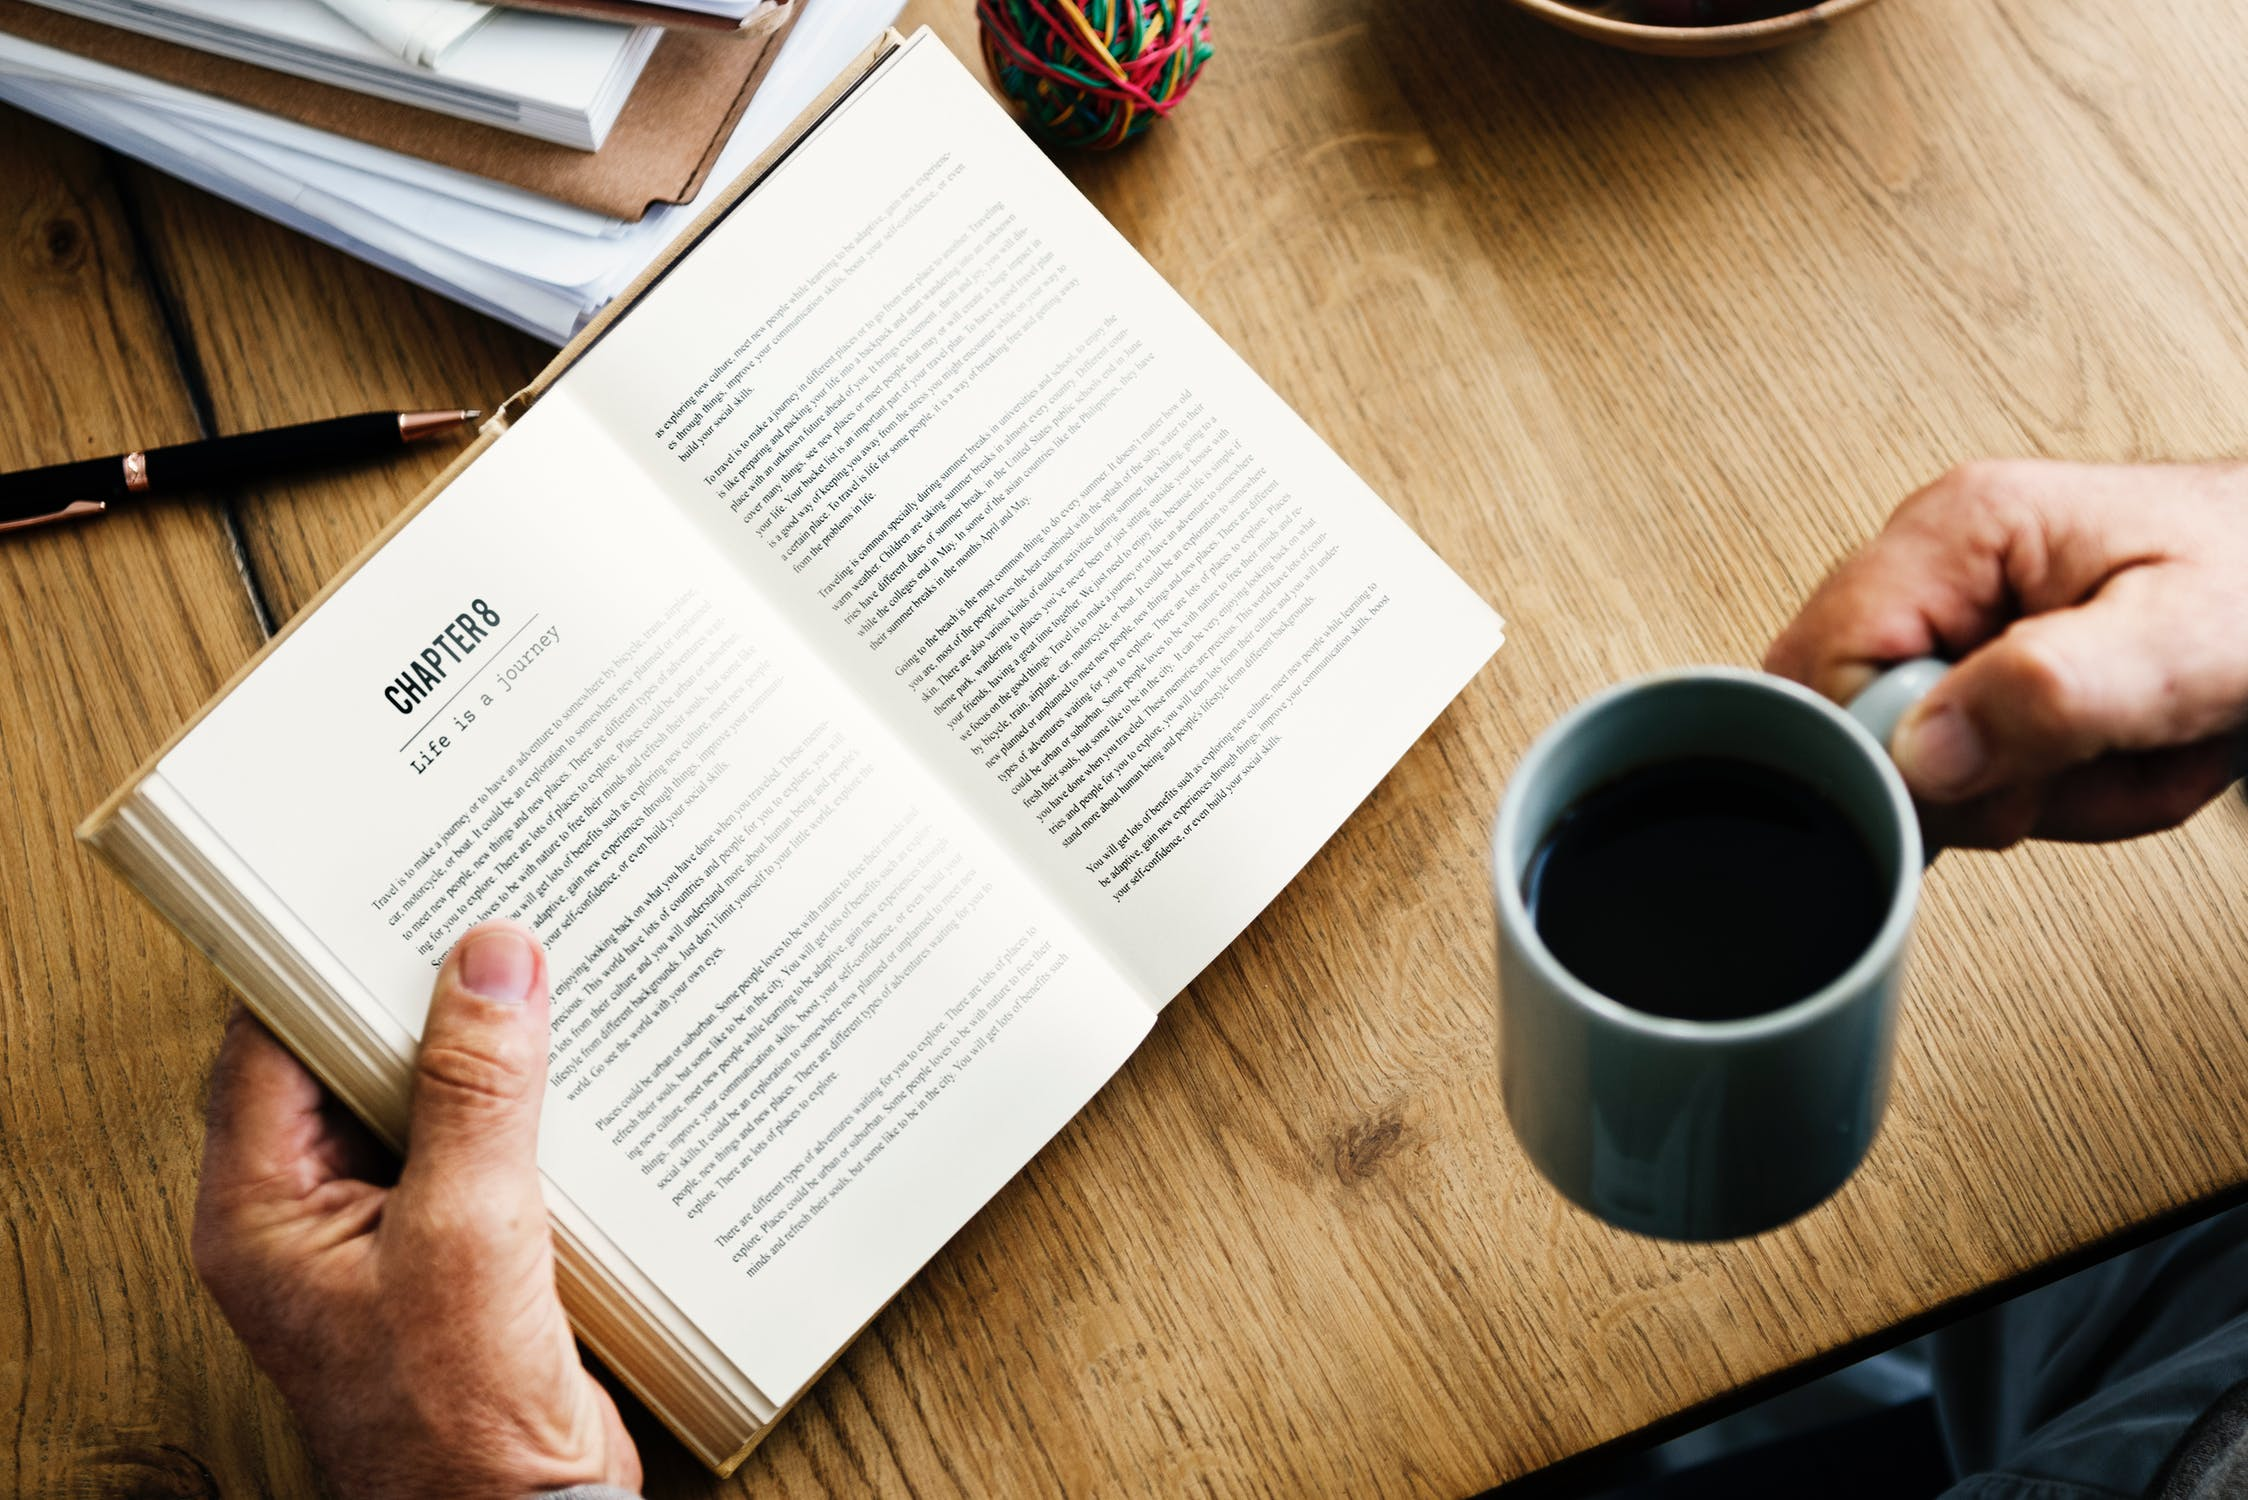 İsme göre kitap seçmek